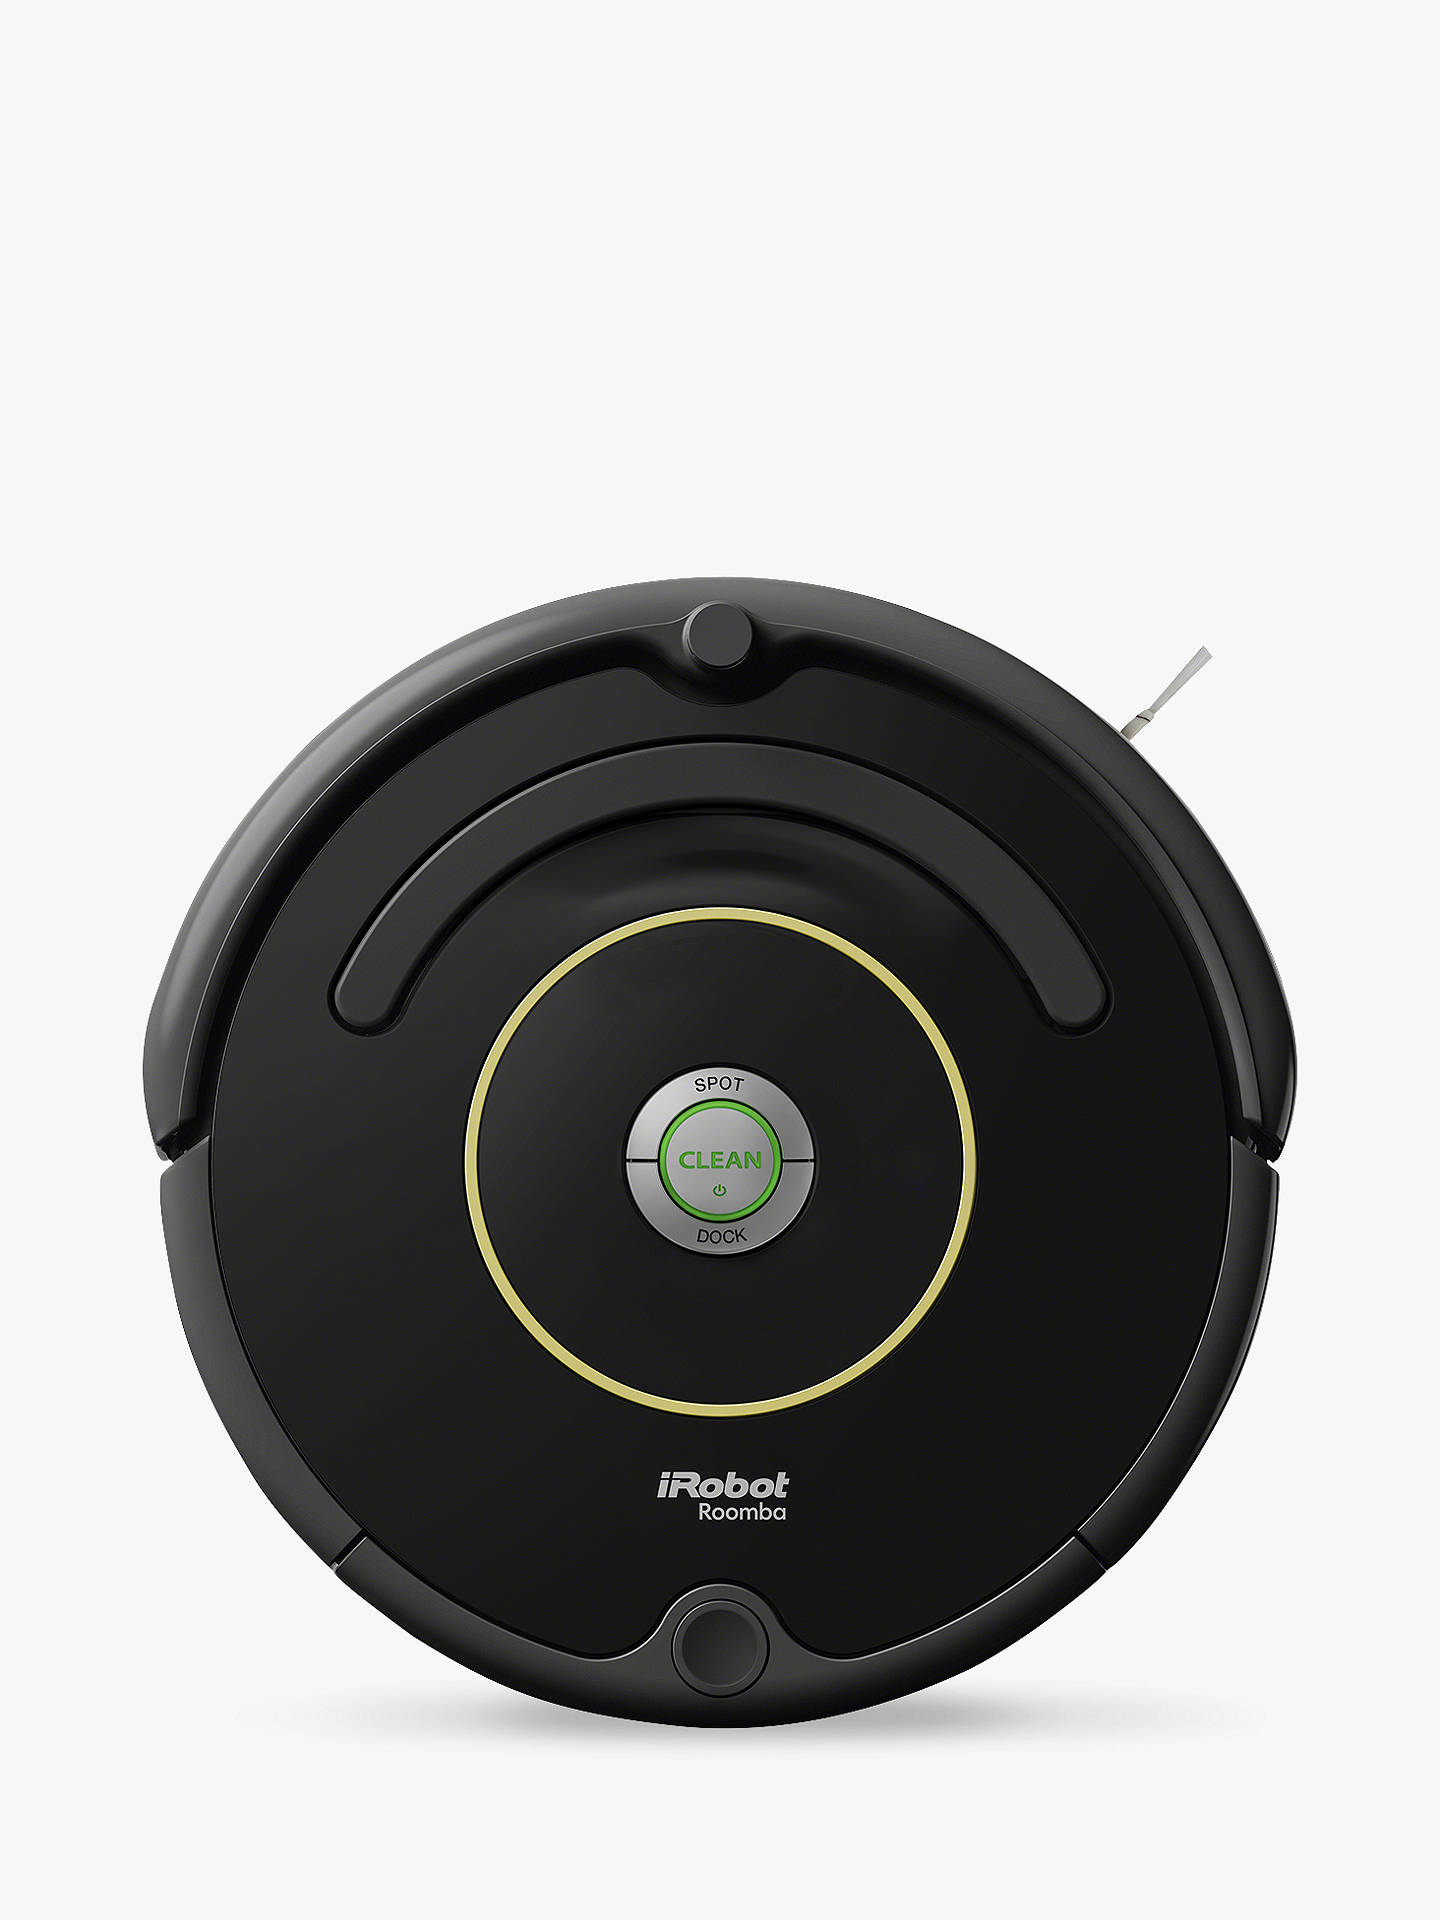 iRobot Roomba 612 Robot Vacuum Cleaner, Black